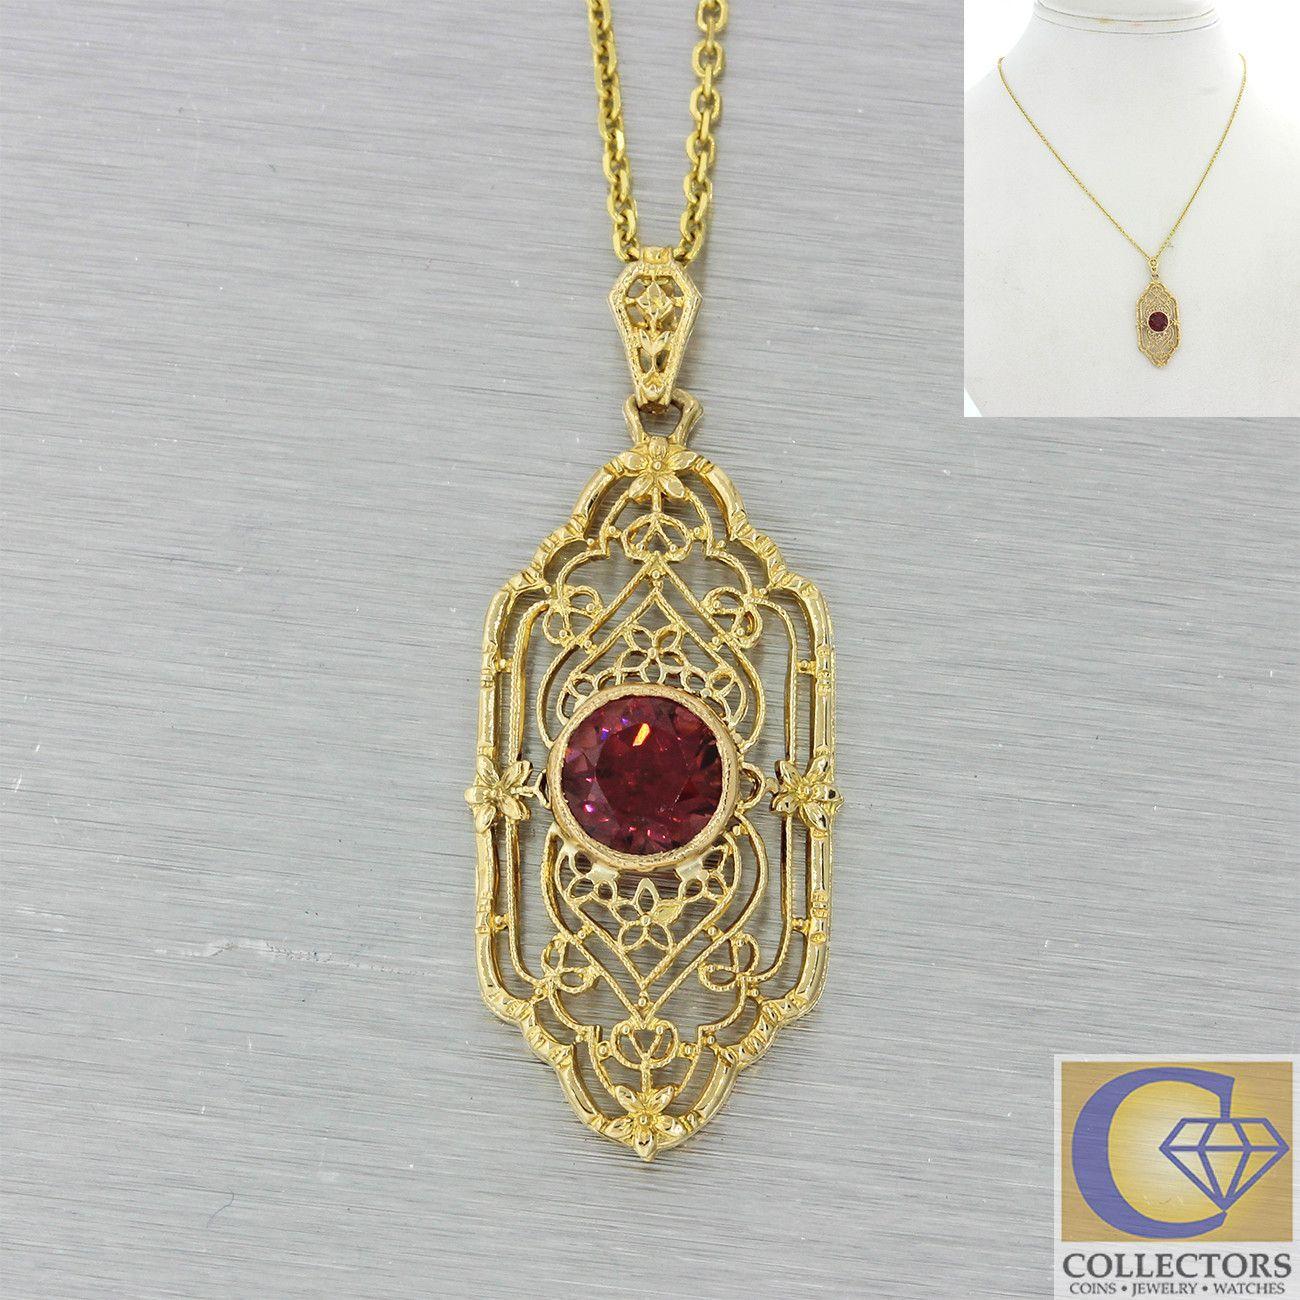 S antique art deco k solid yellow gold rubellite garnet